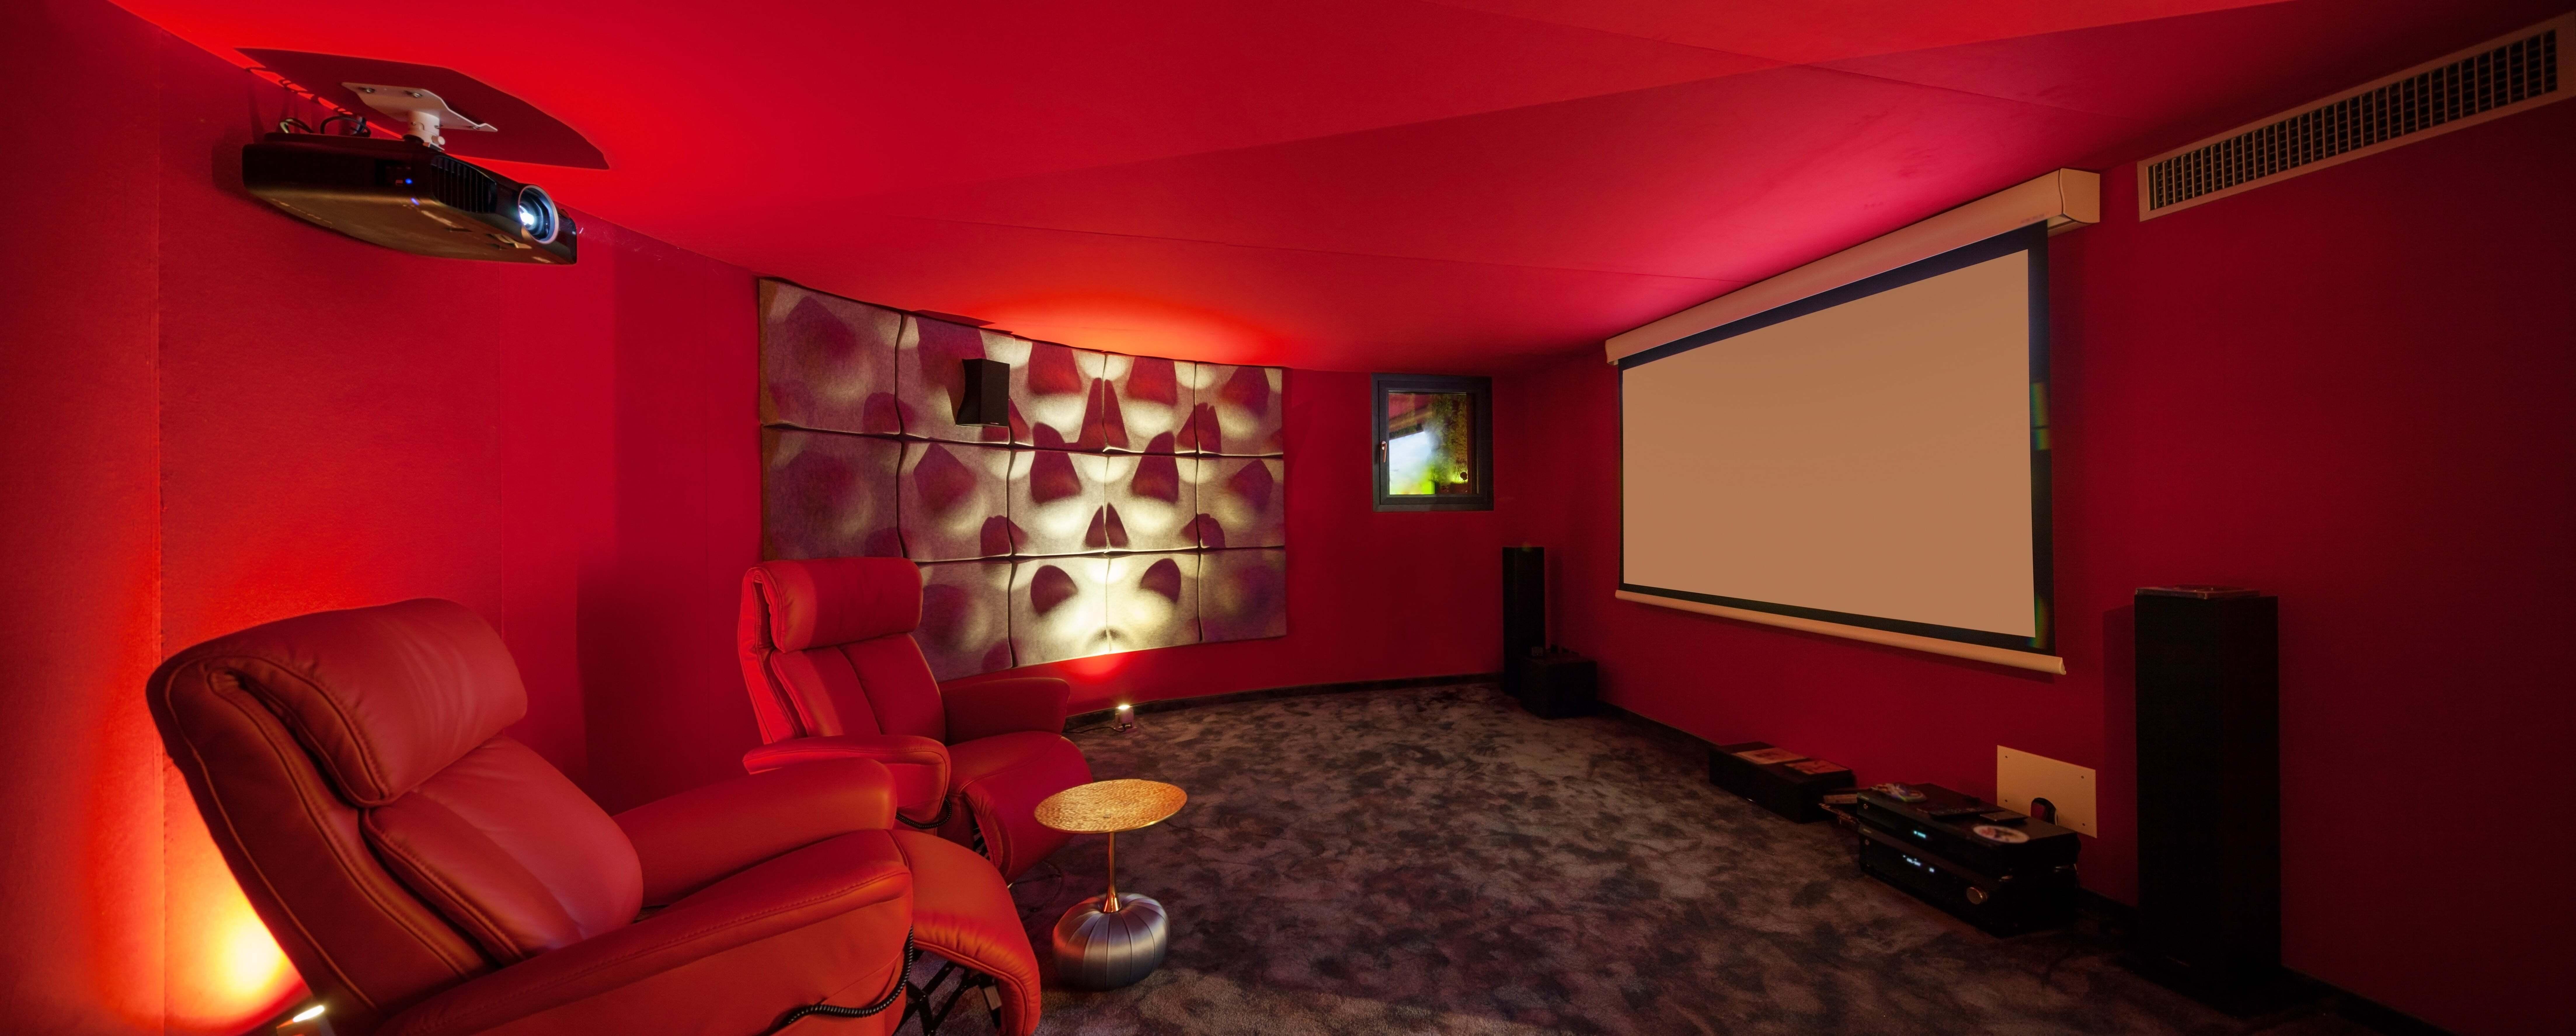 Home Theater bInstaller